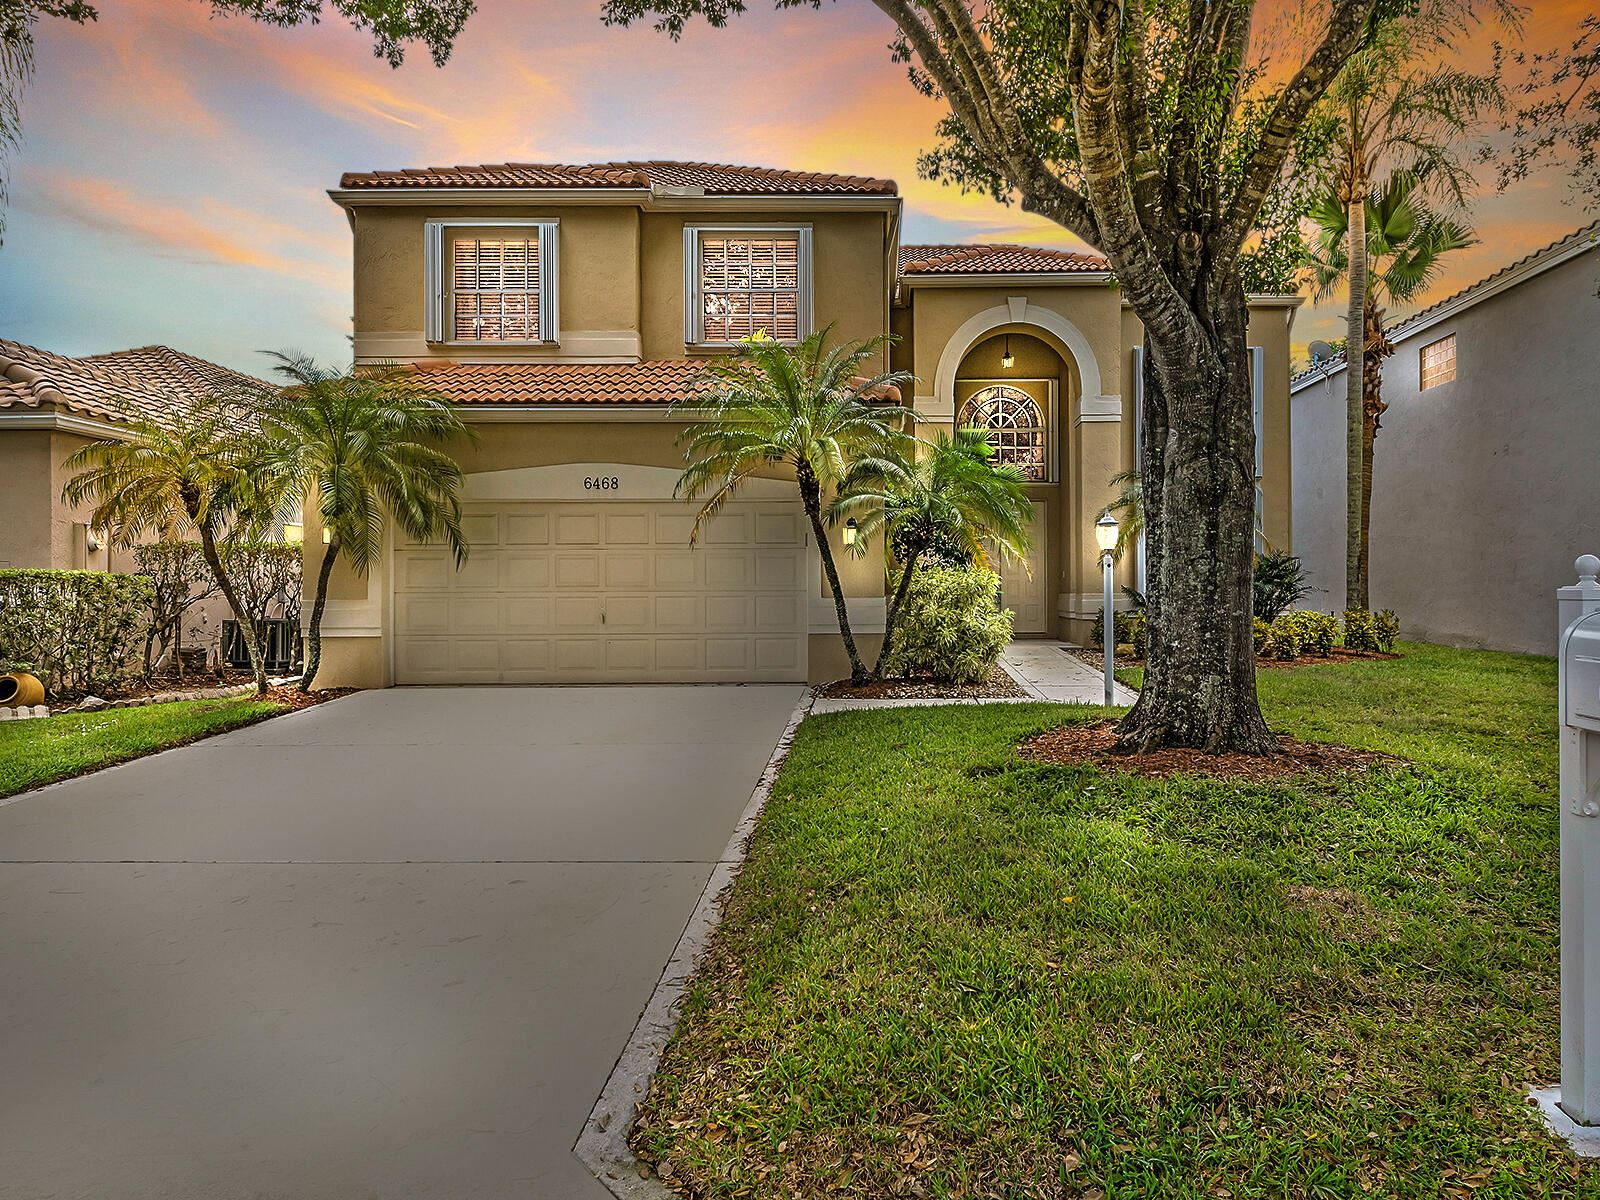 6468 NW 78th Place, Parkland, FL 33067 - MLS#: RX-10745913